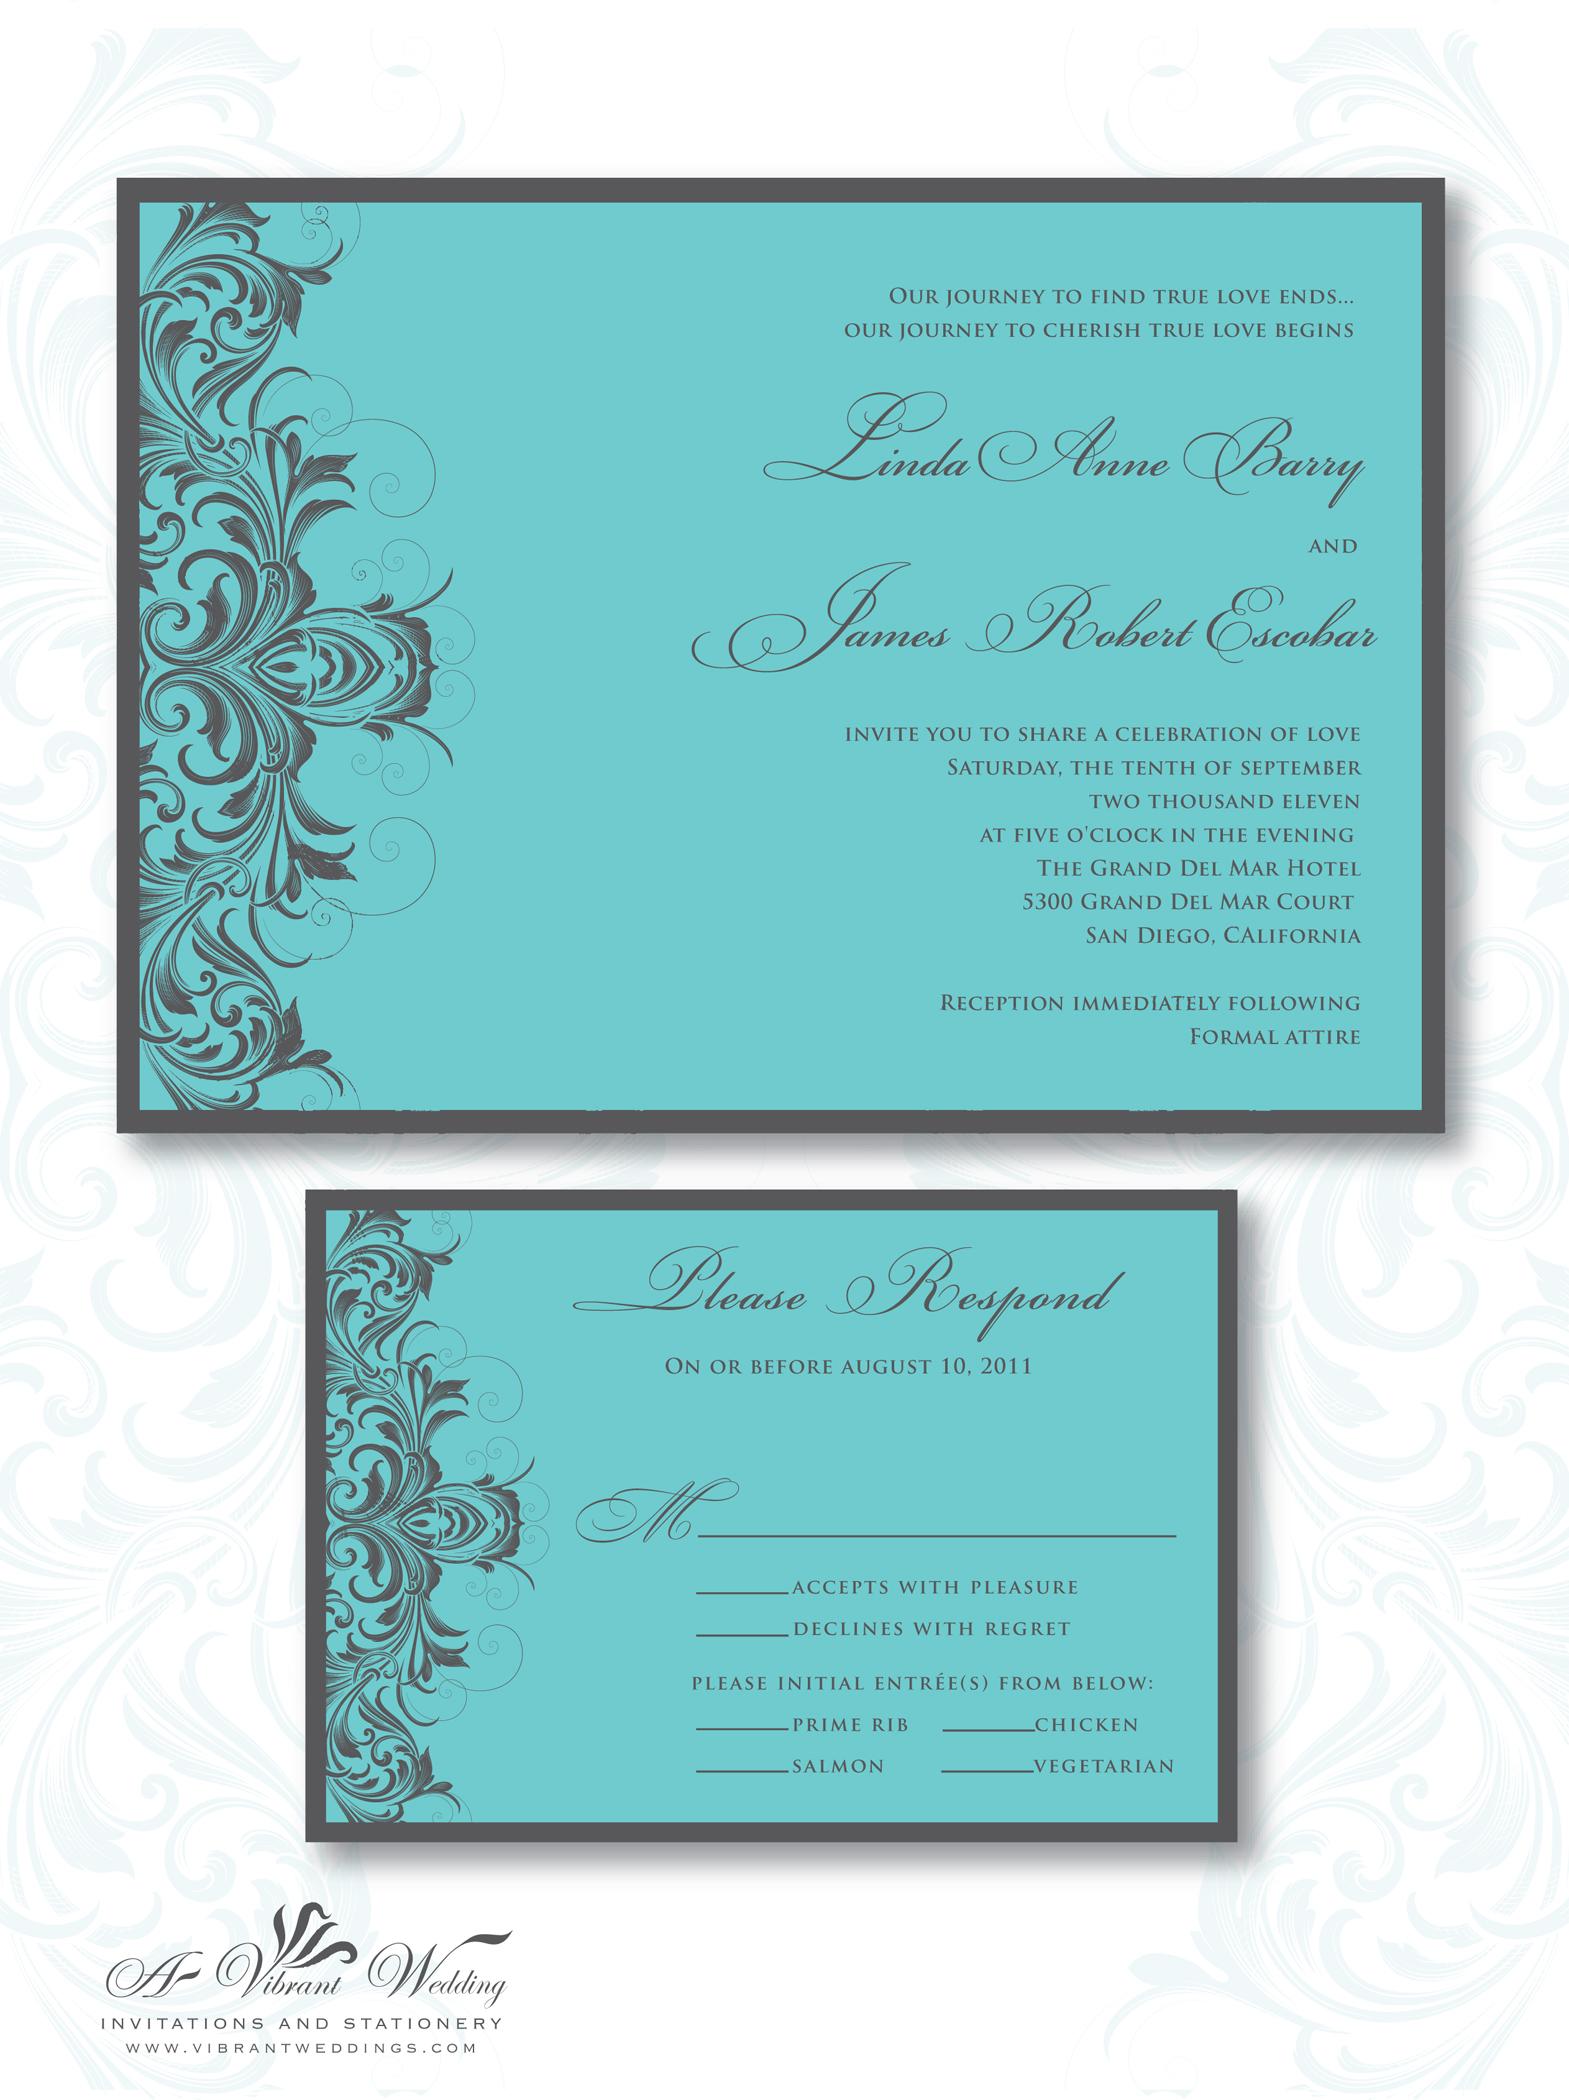 gray wedding invitation  A Vibrant Wedding Invitations